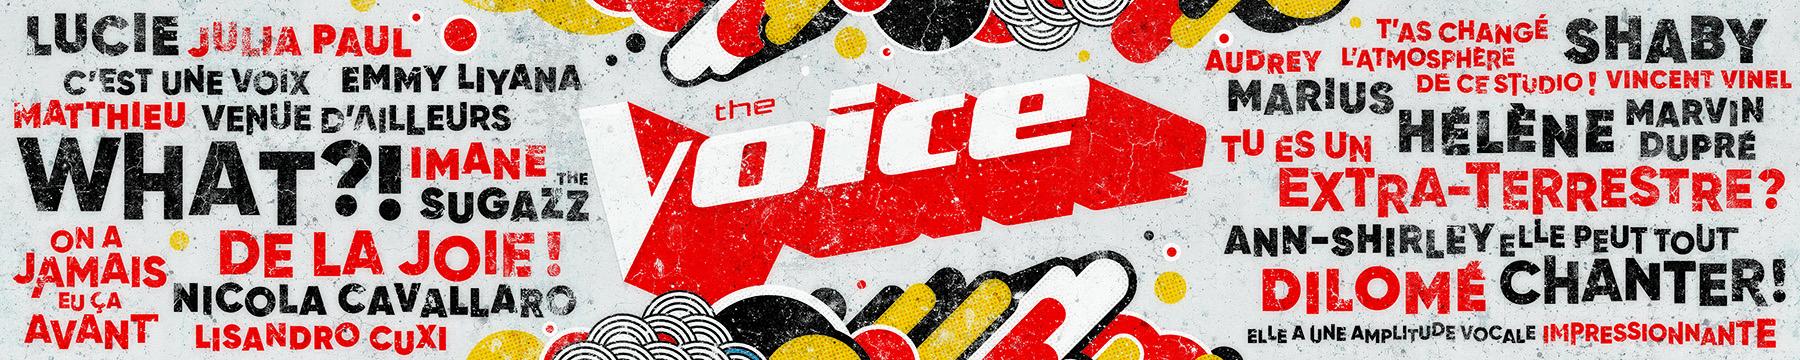 The Voice France - Fresque